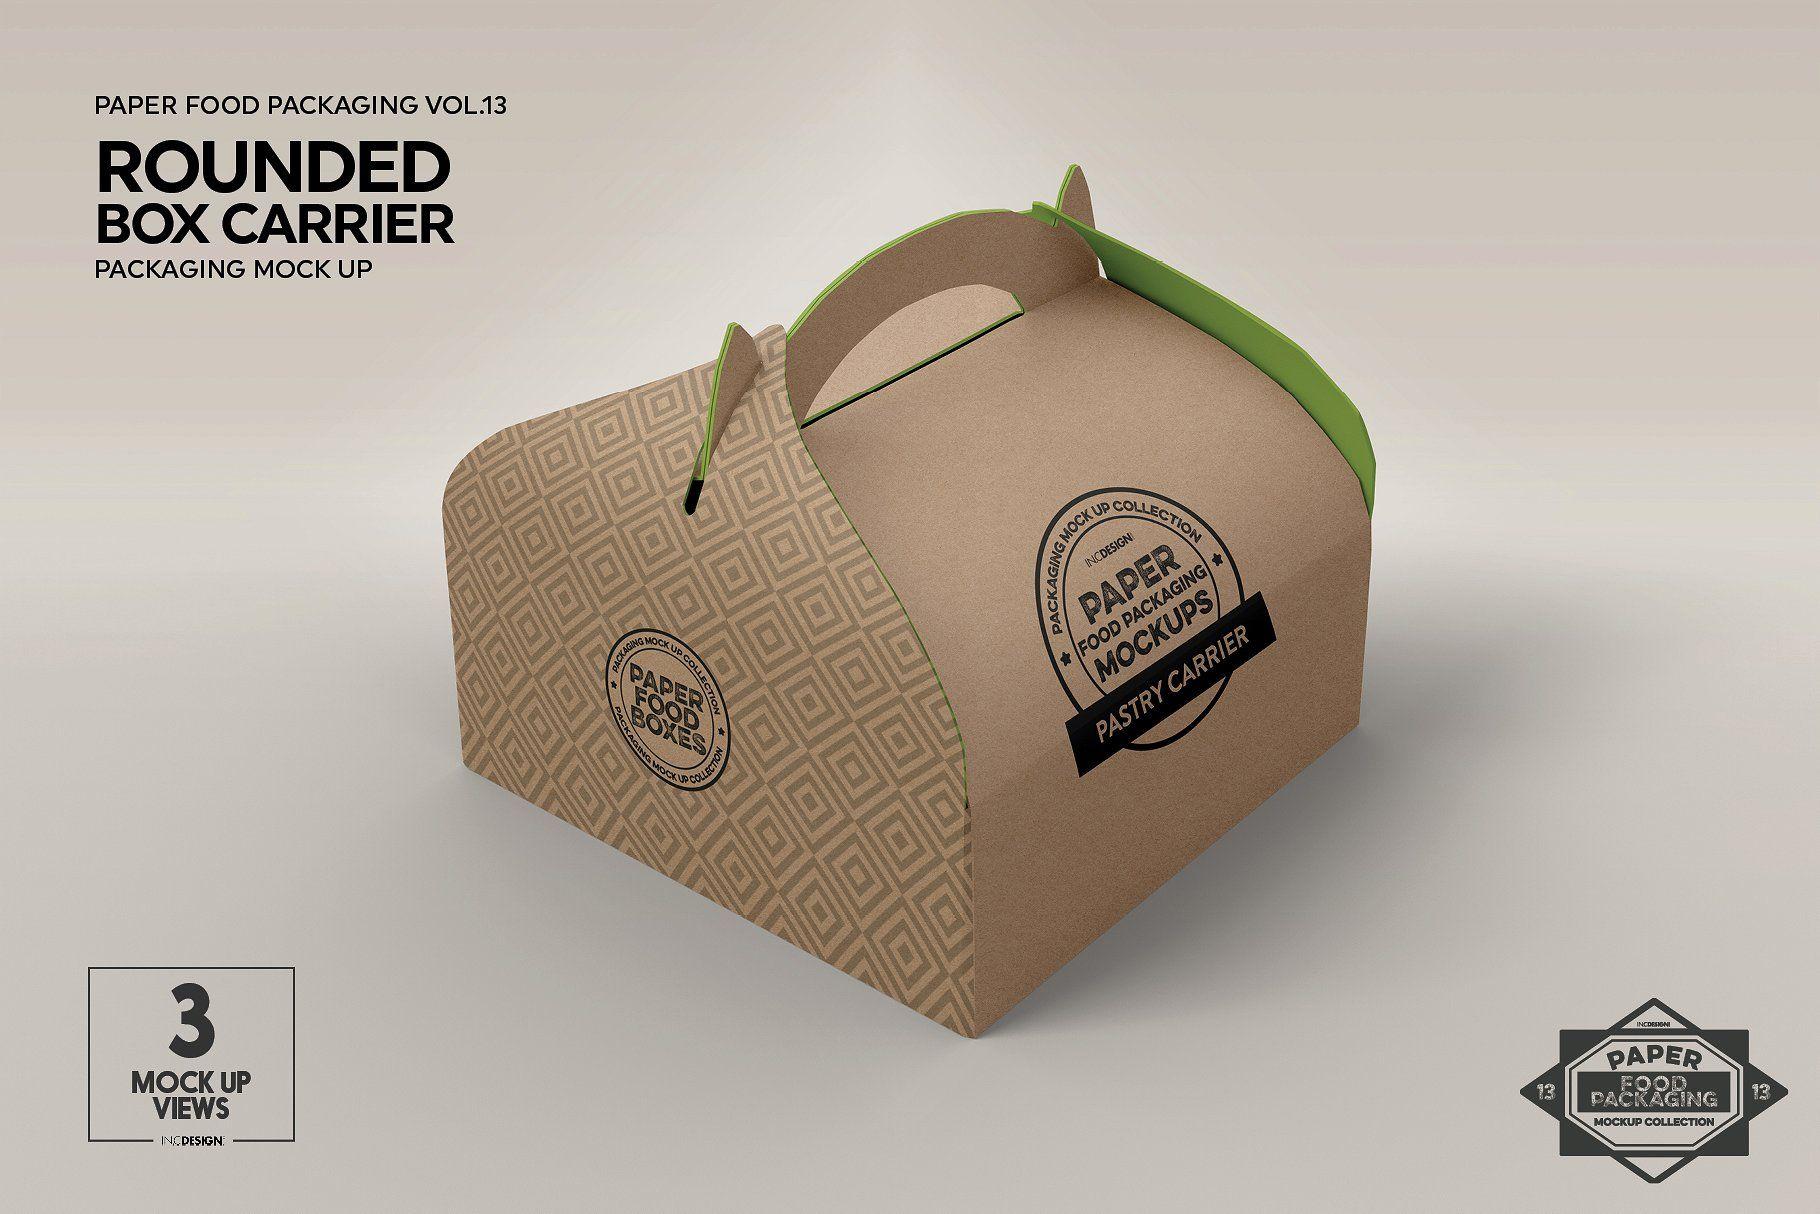 Download Vol 13 Food Box Packaging Mockups Food Box Packaging Packaging Mockup Free Packaging Mockup